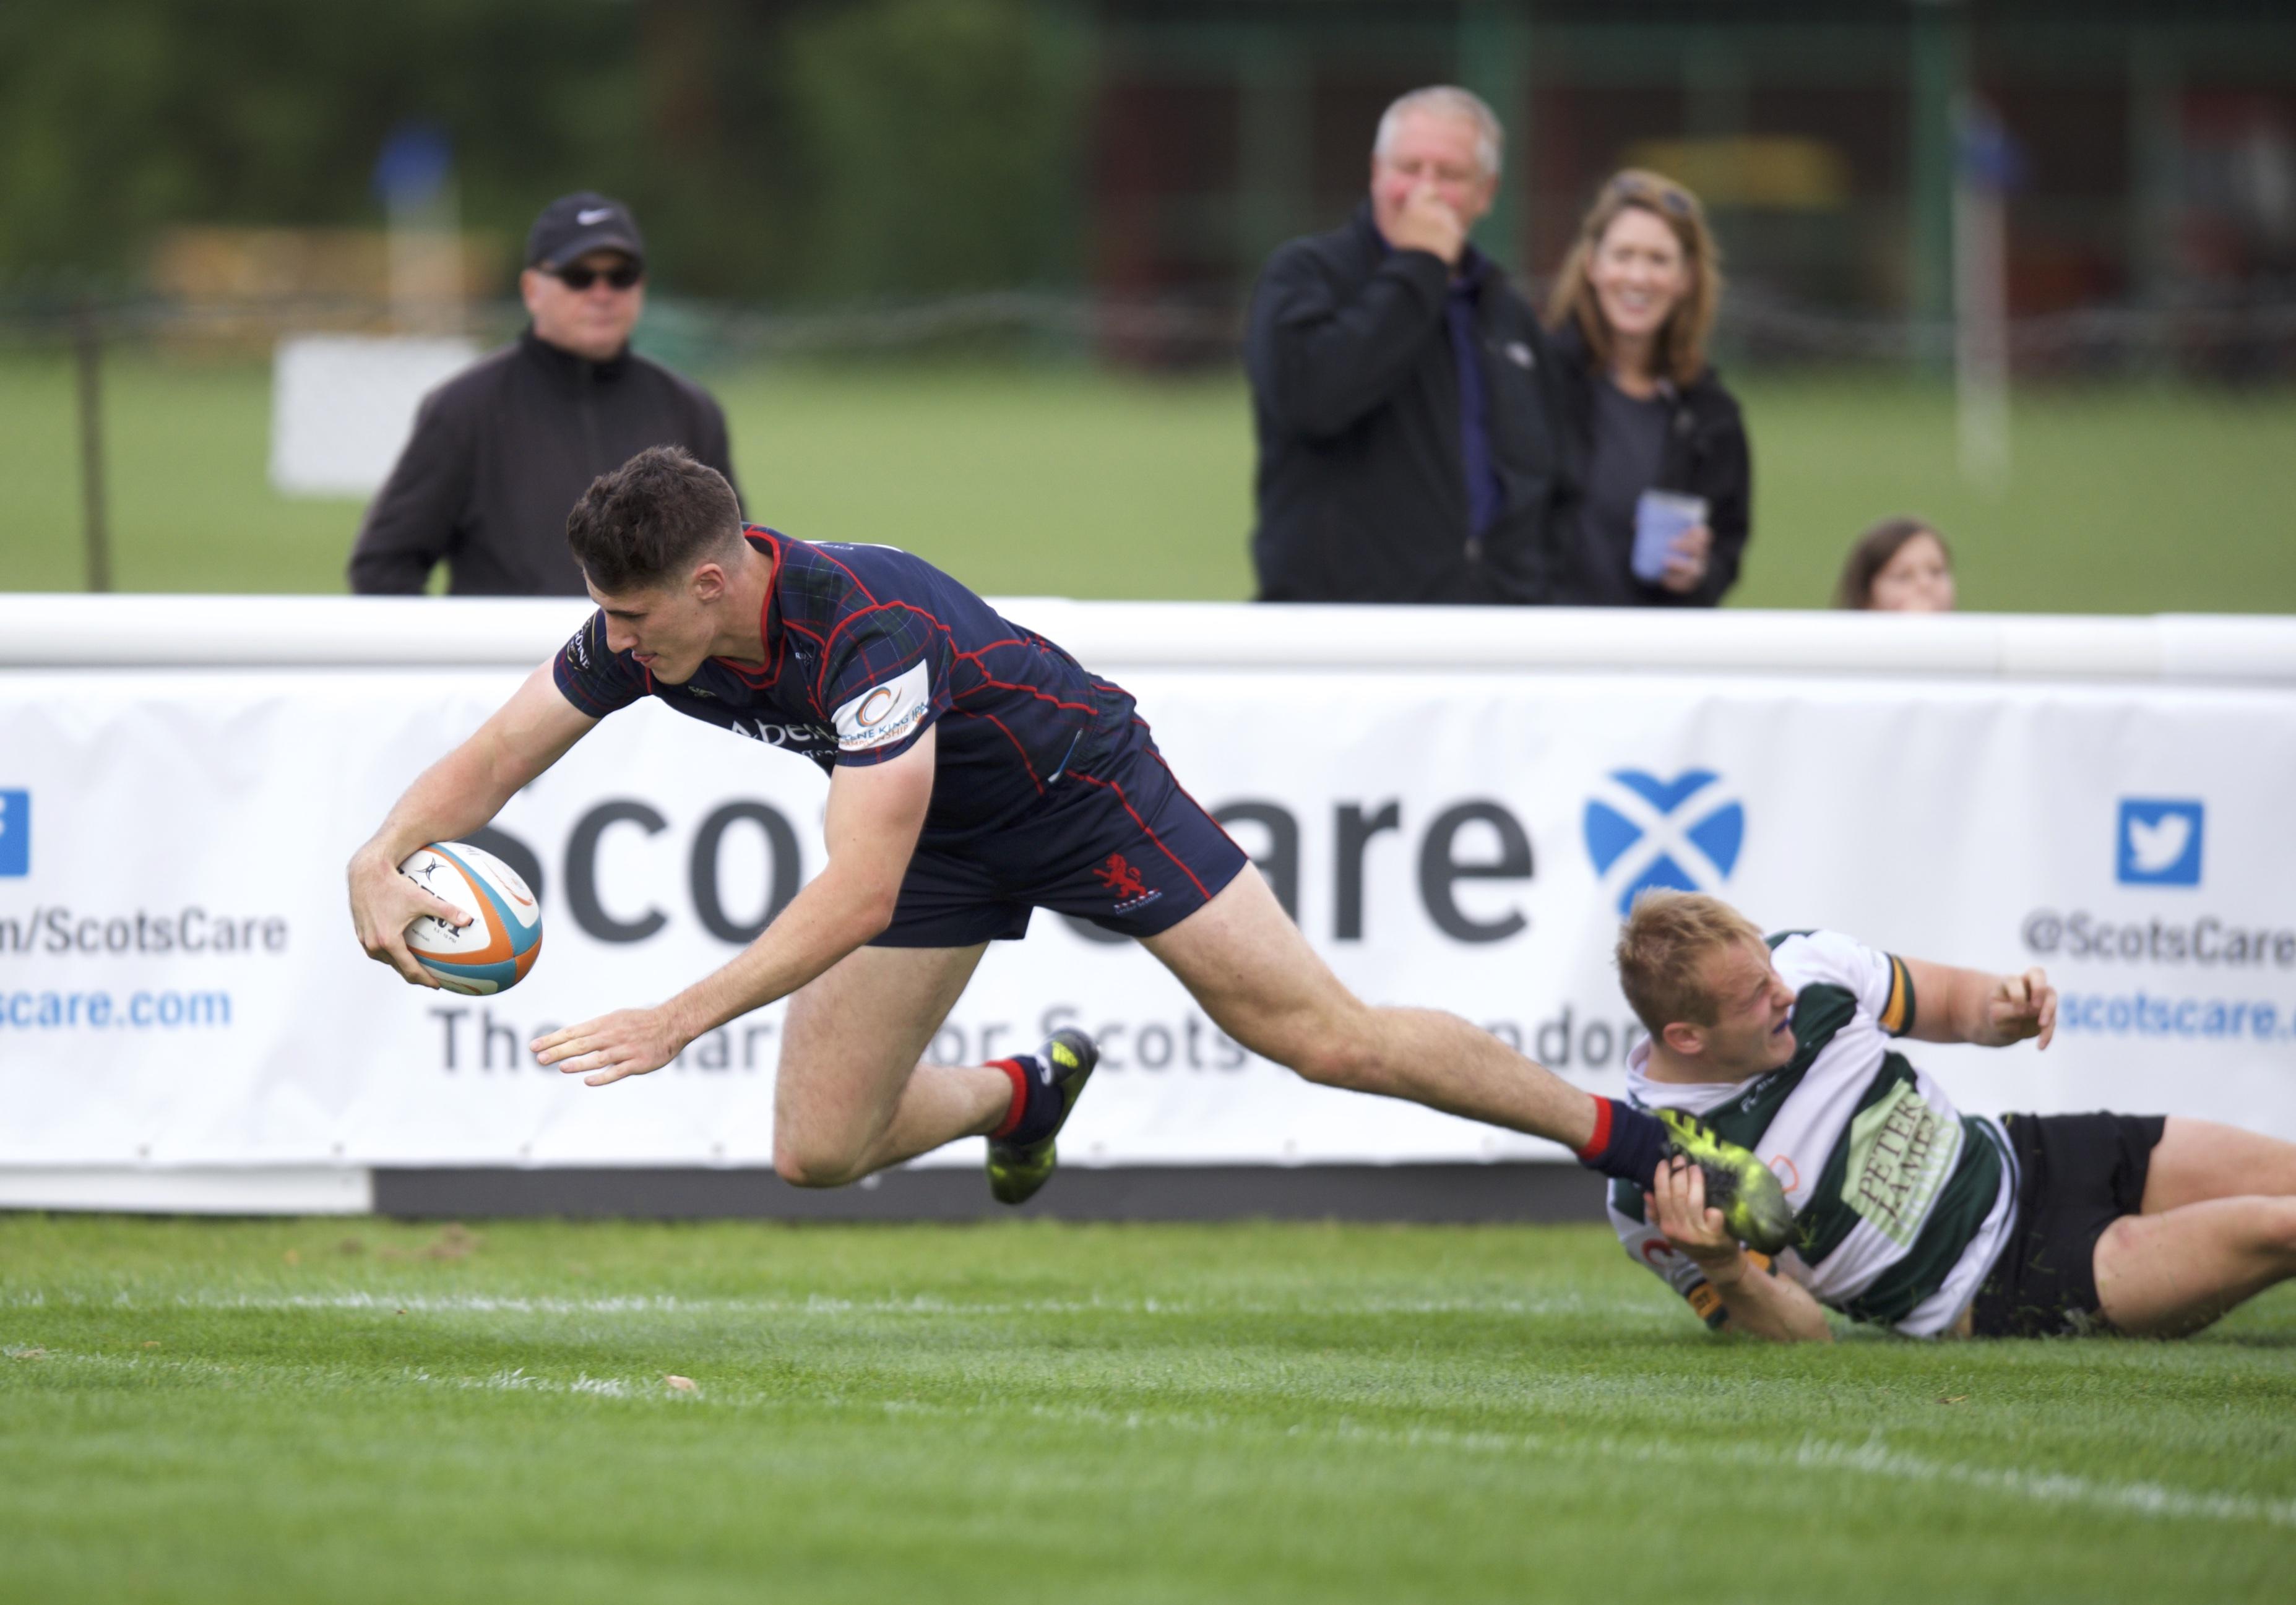 9 November: London Scottish Commemorative Rugby Fixture